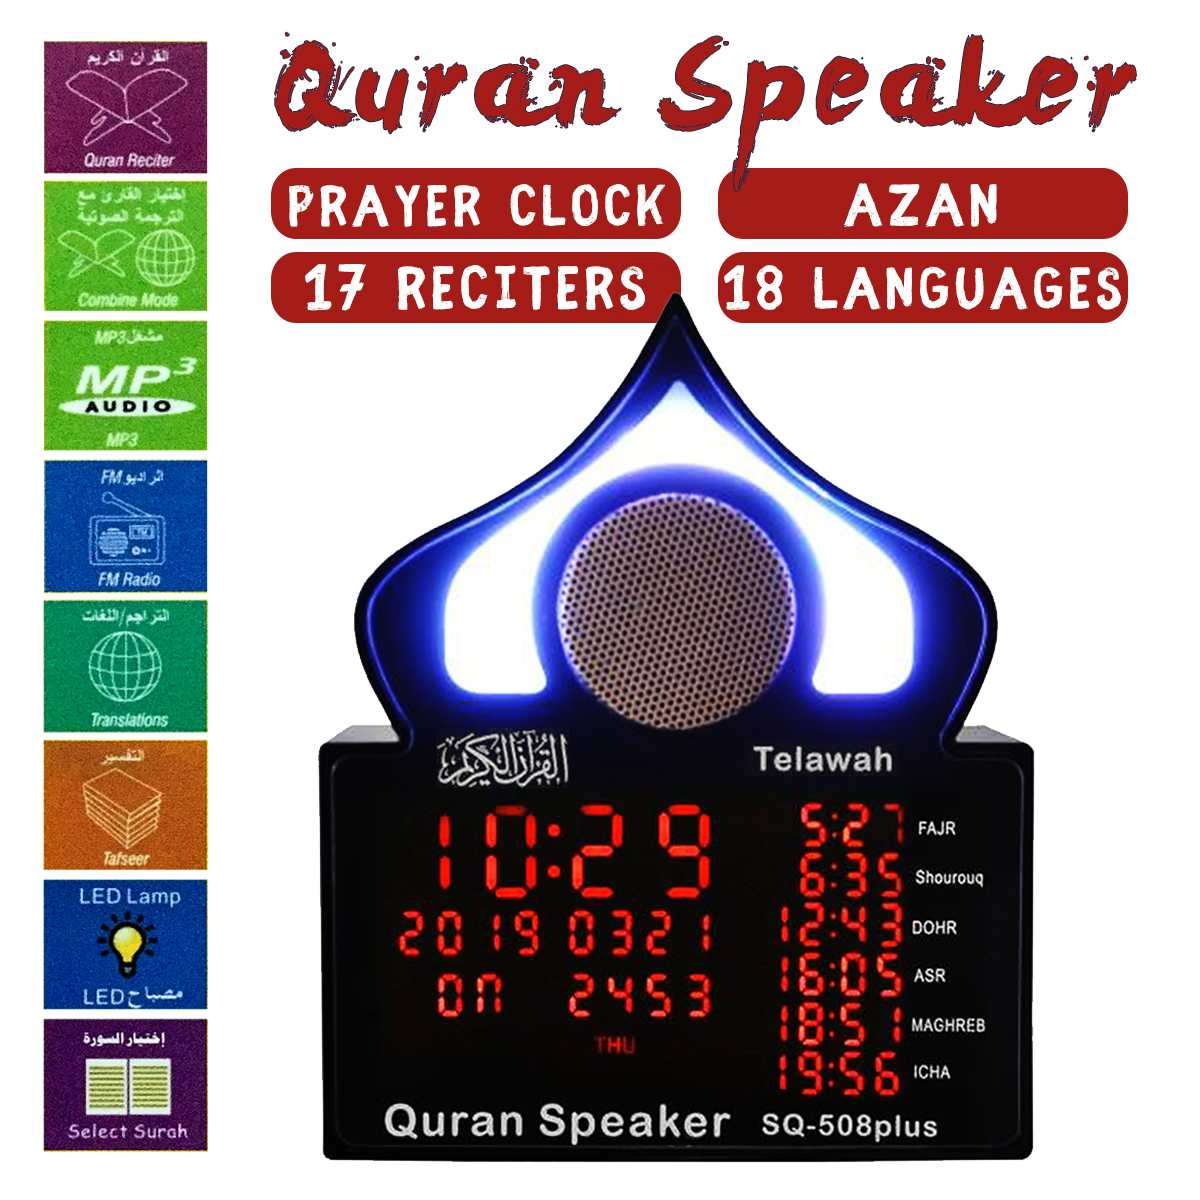 Led Lamp Quran 8g Coran Bibovi Player 8nNwmv0